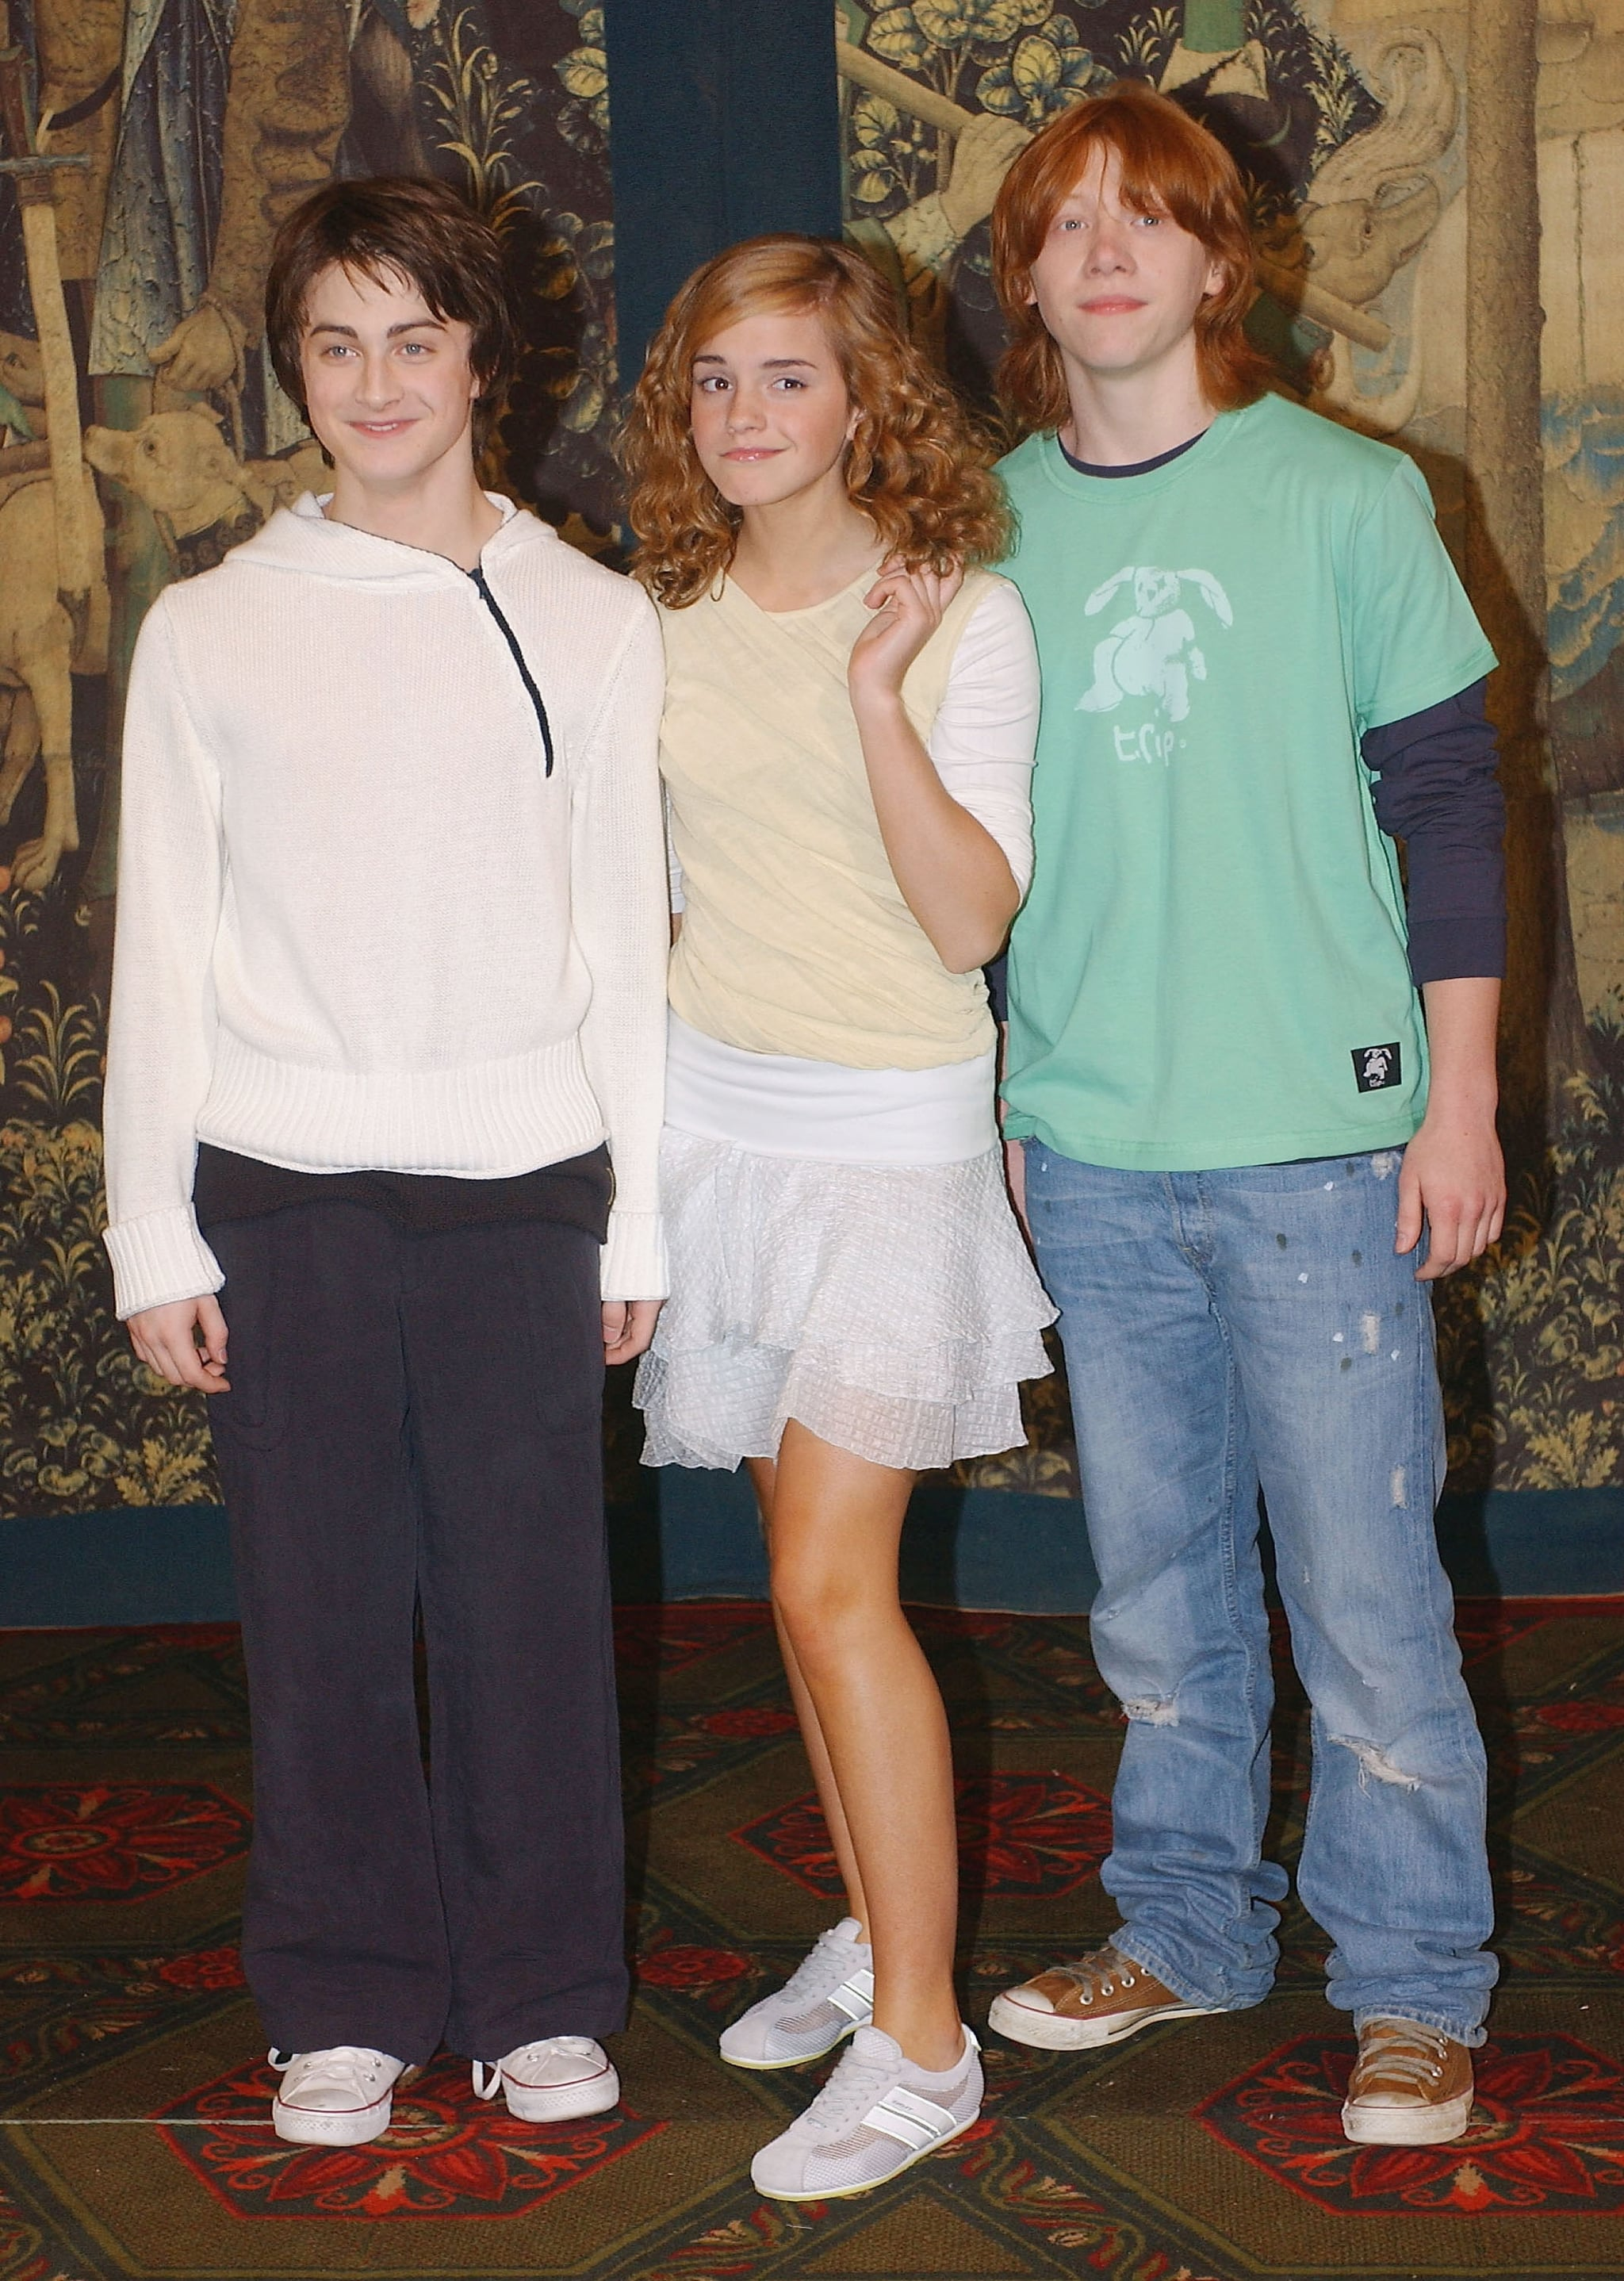 Emma Watson, Rupert Grint, Daniel Radcliffe and Bonnie Wri ... |Radcliffe Watson Grint